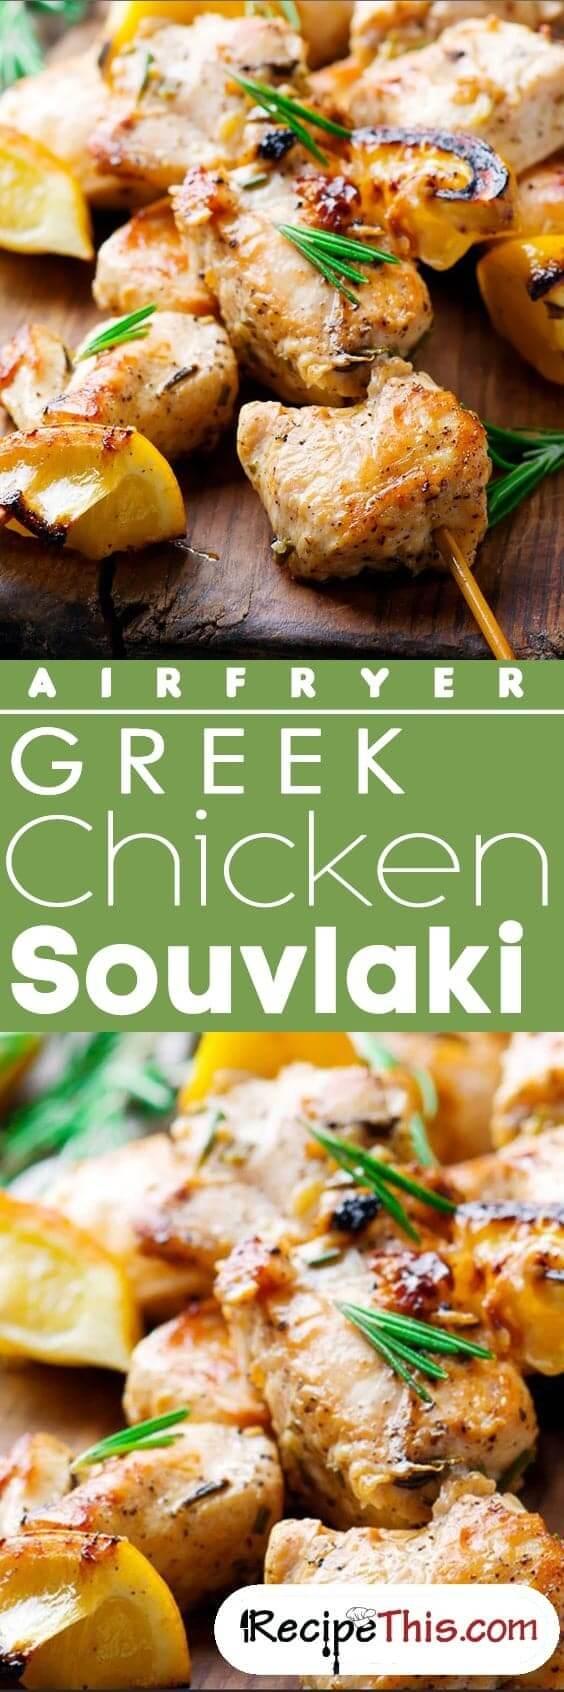 Airfryer Greek Chicken Souvlaki